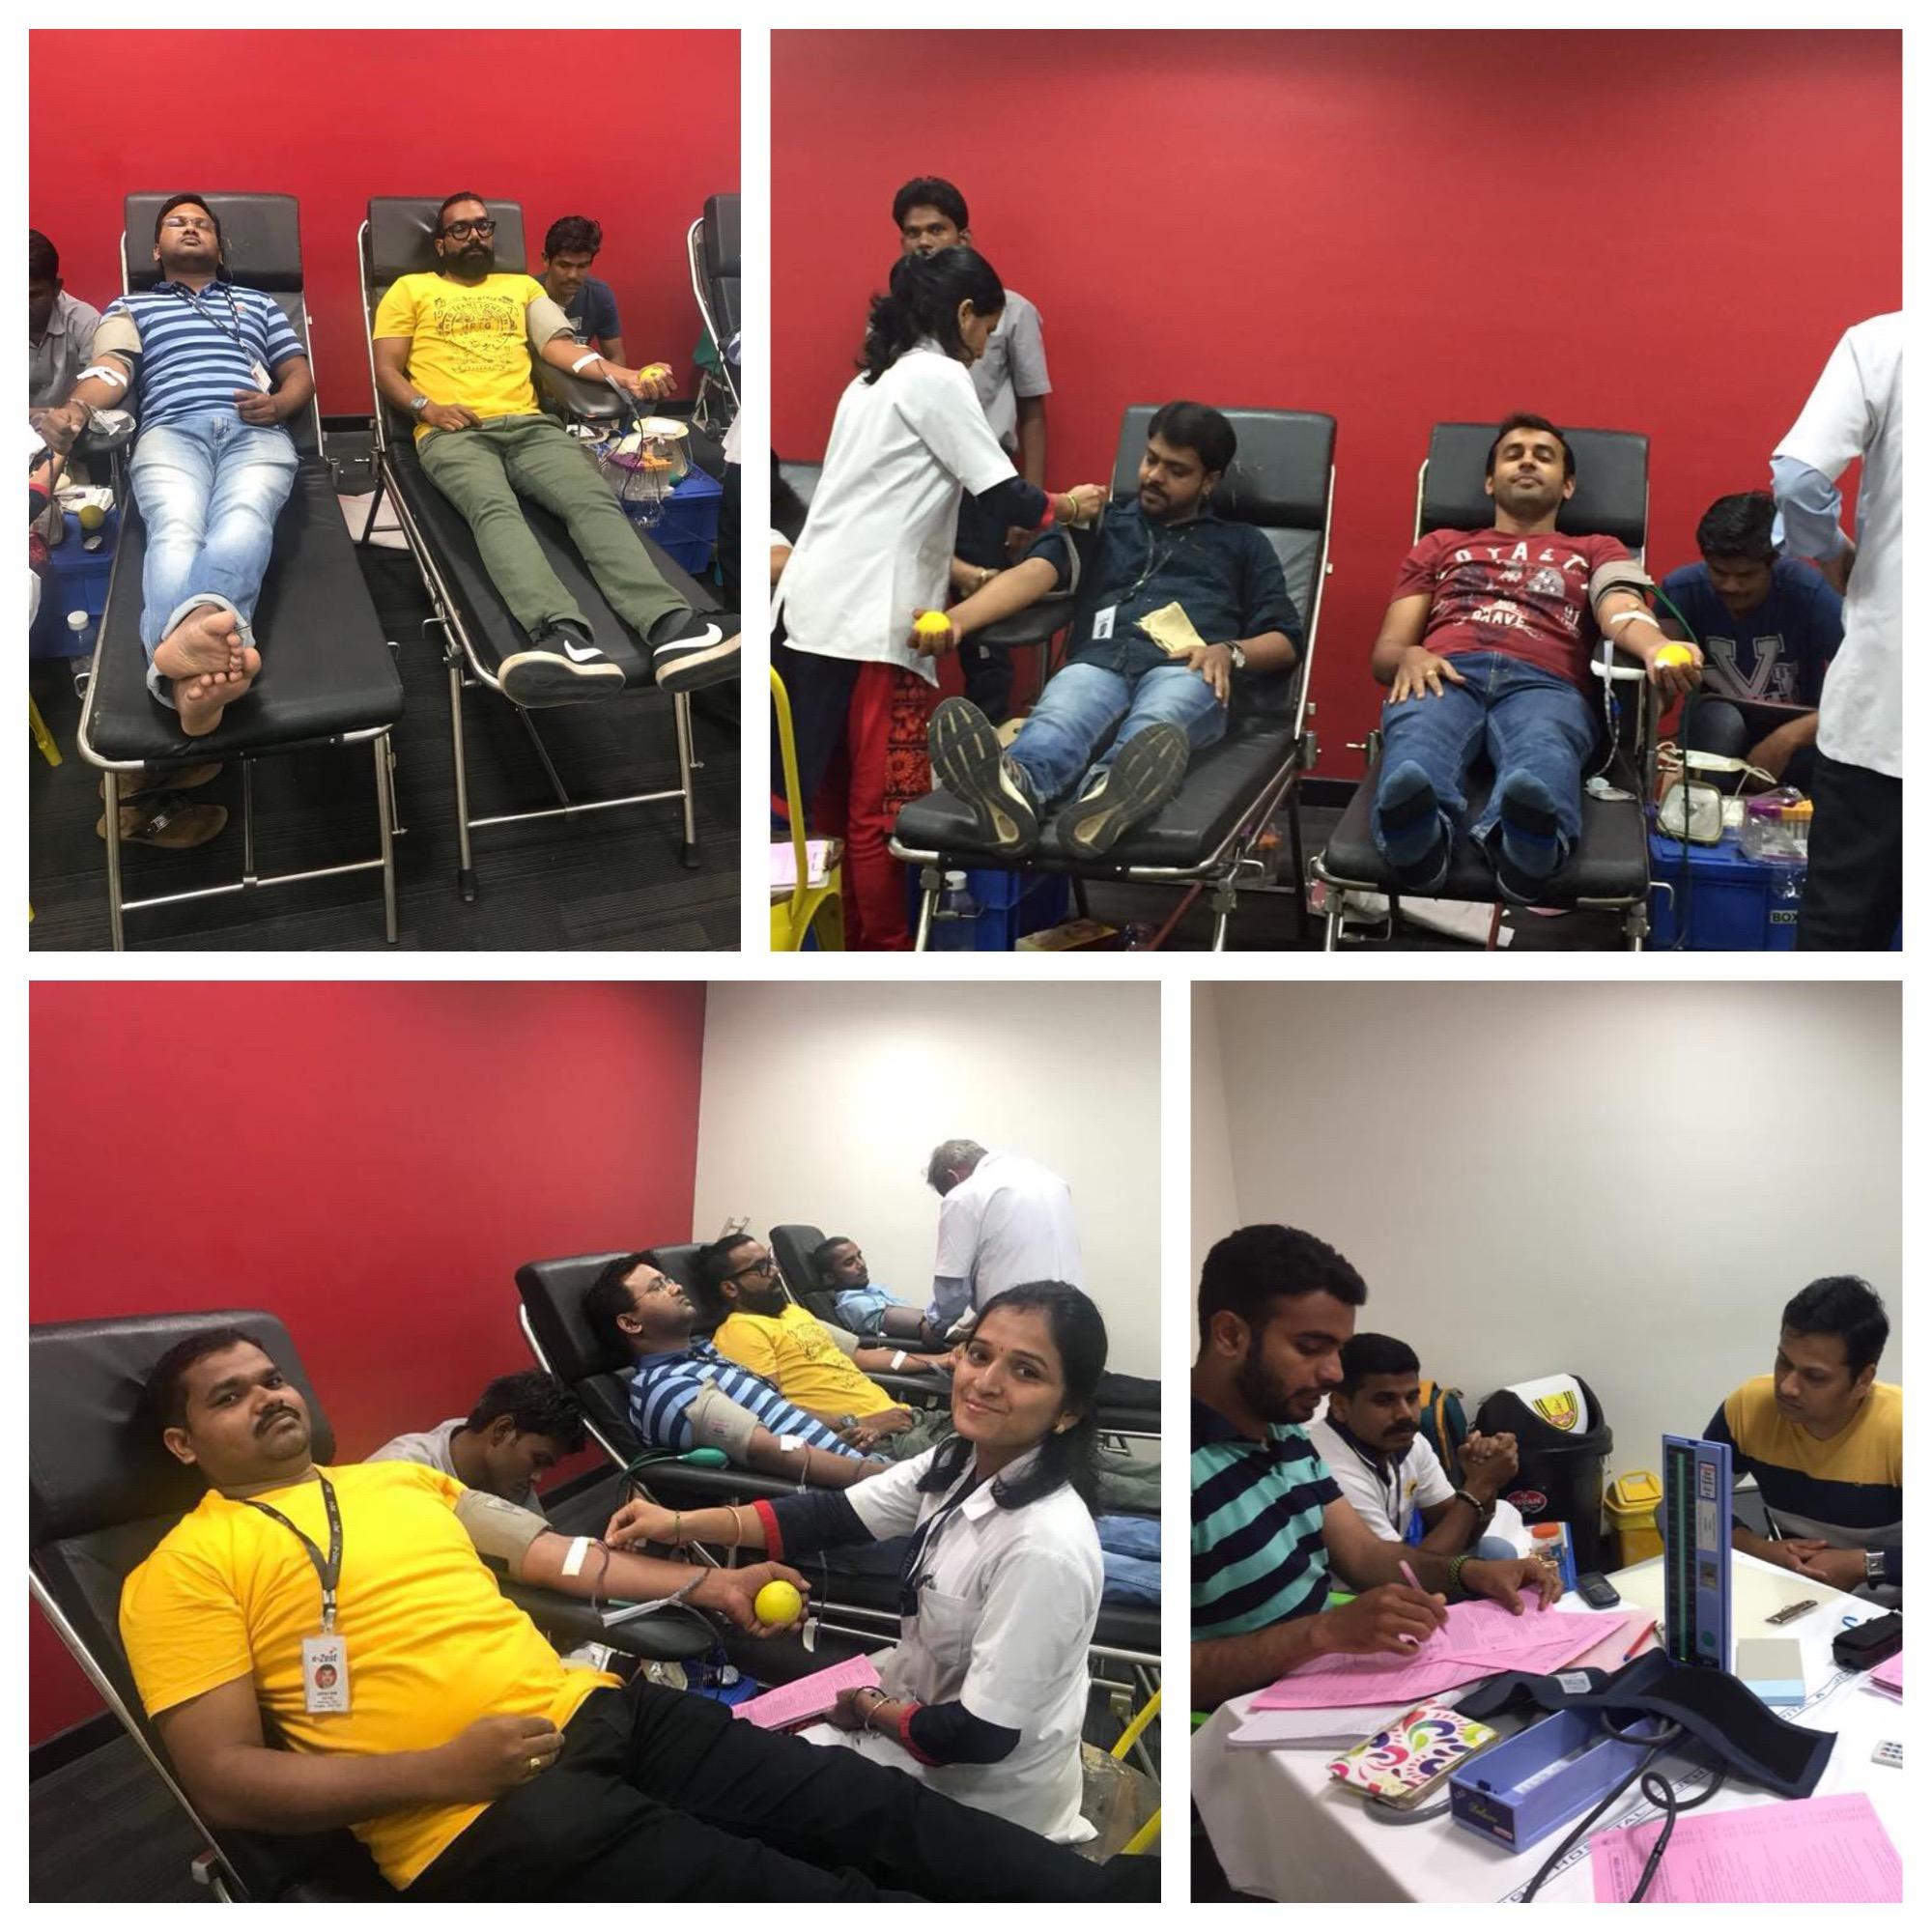 blood-donation-2017 (1)-1.jpg